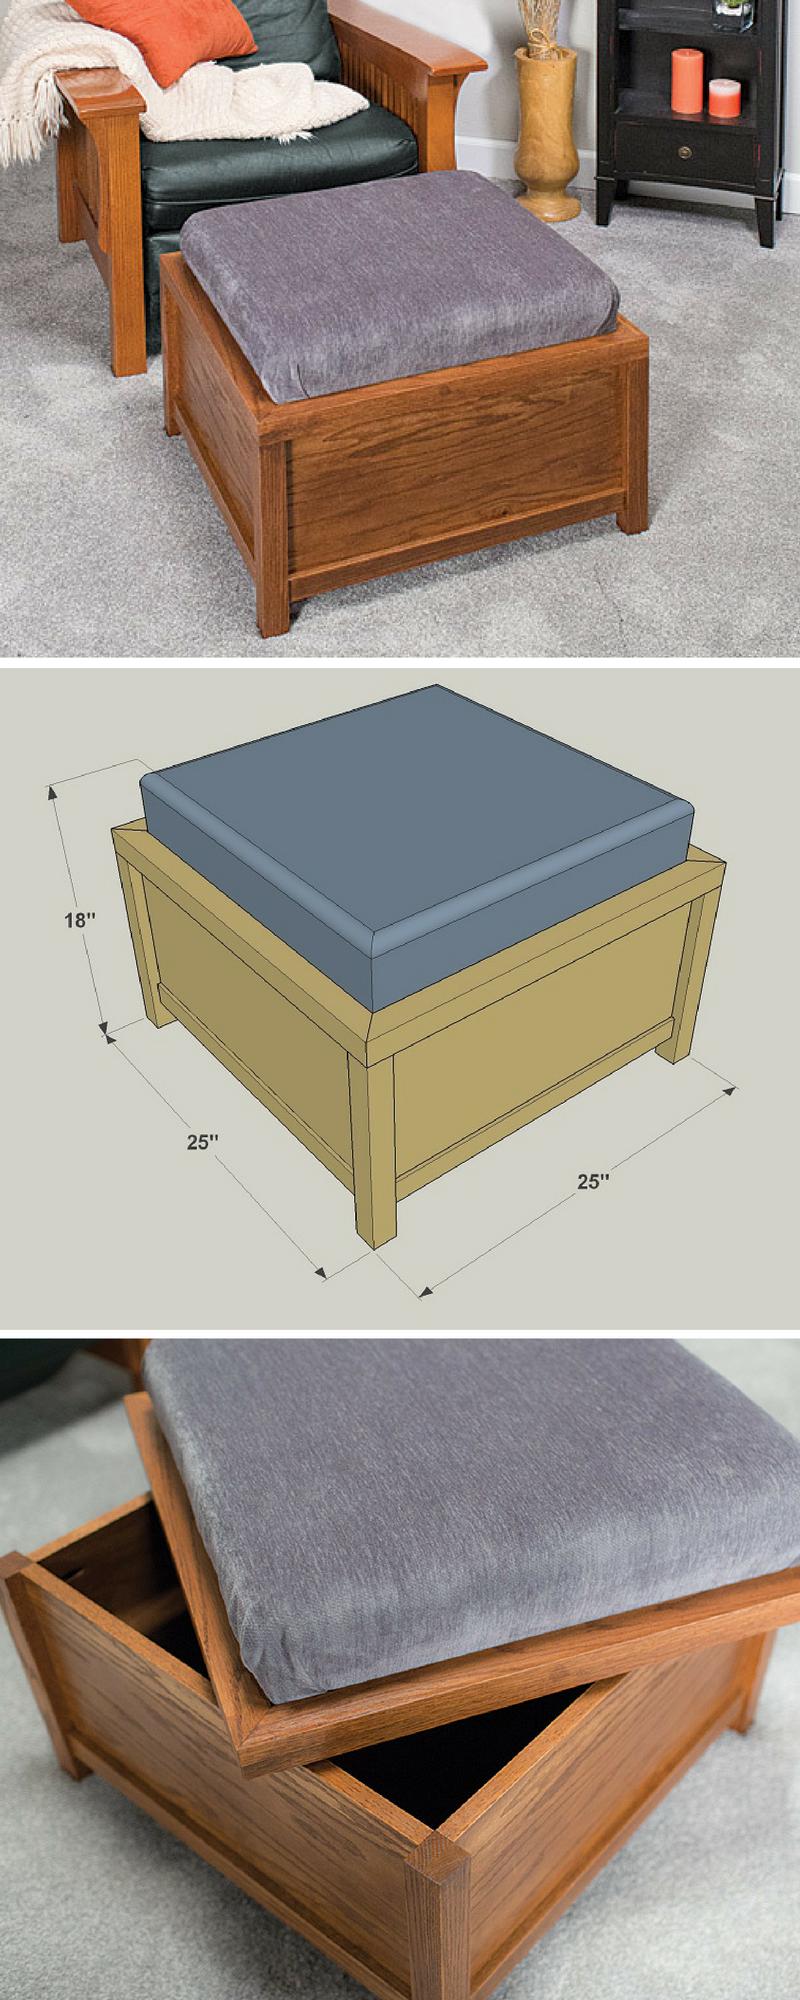 How to build a DIY Storage Ottoman